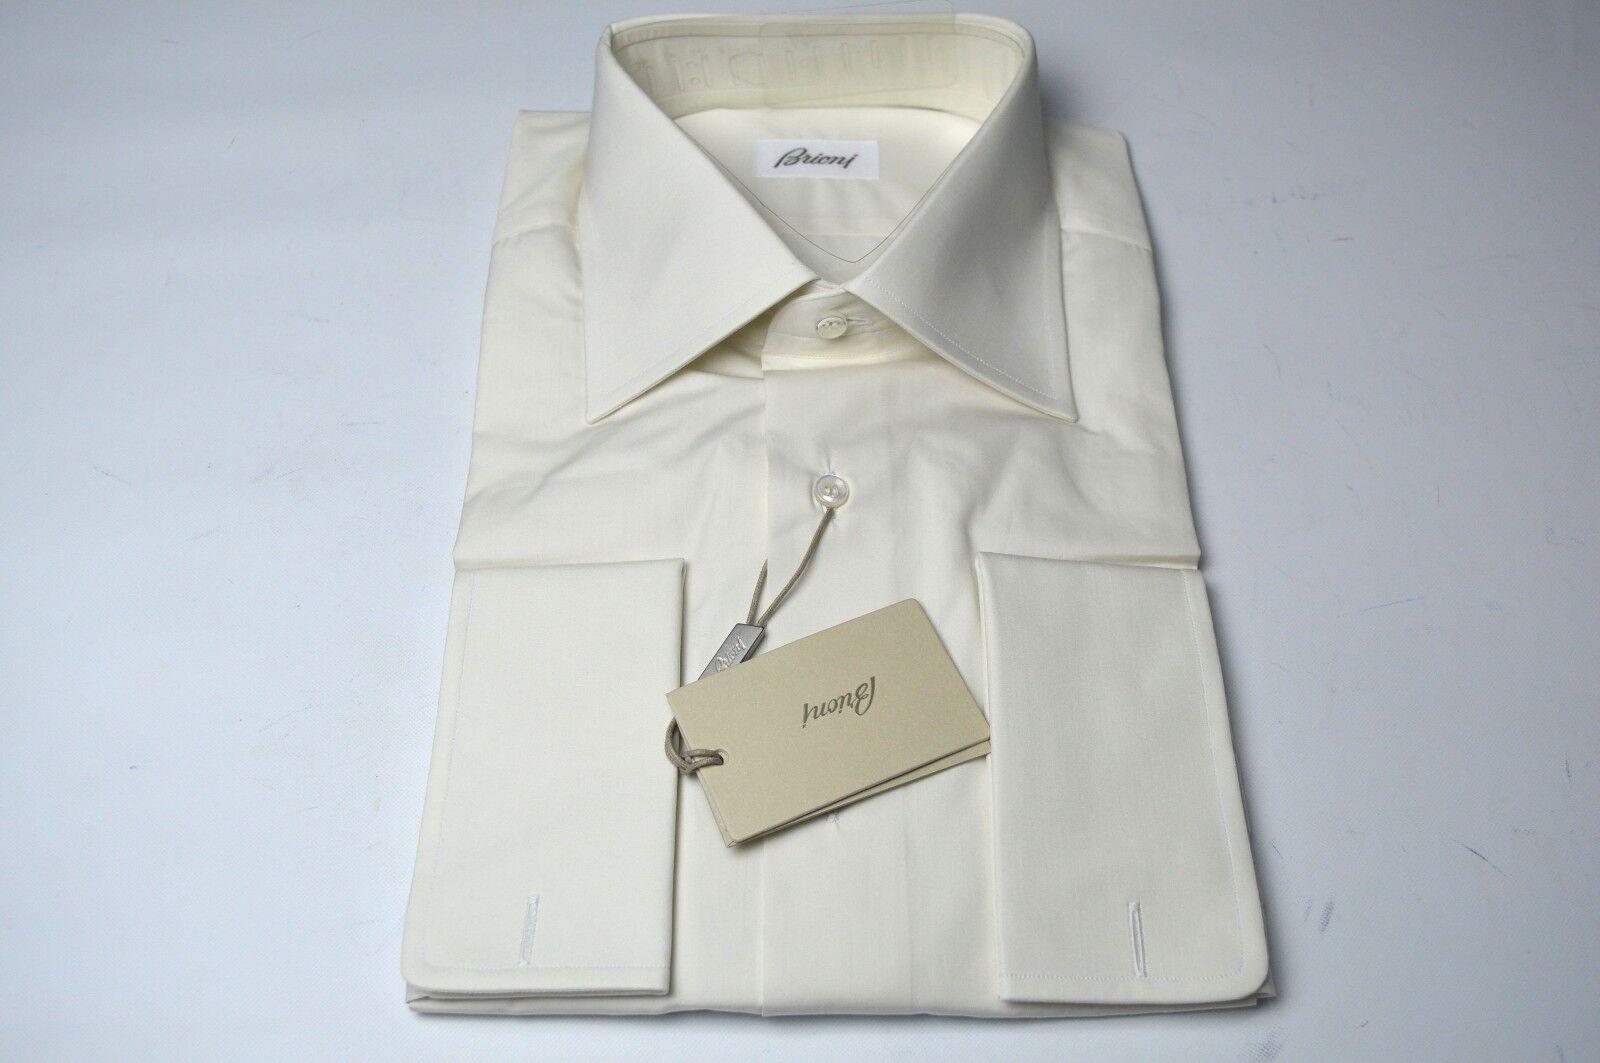 NEW  BRIONI Dress  hemd 100% baumwolle Größe  16.5 Us 42 Eu  (ARA206)